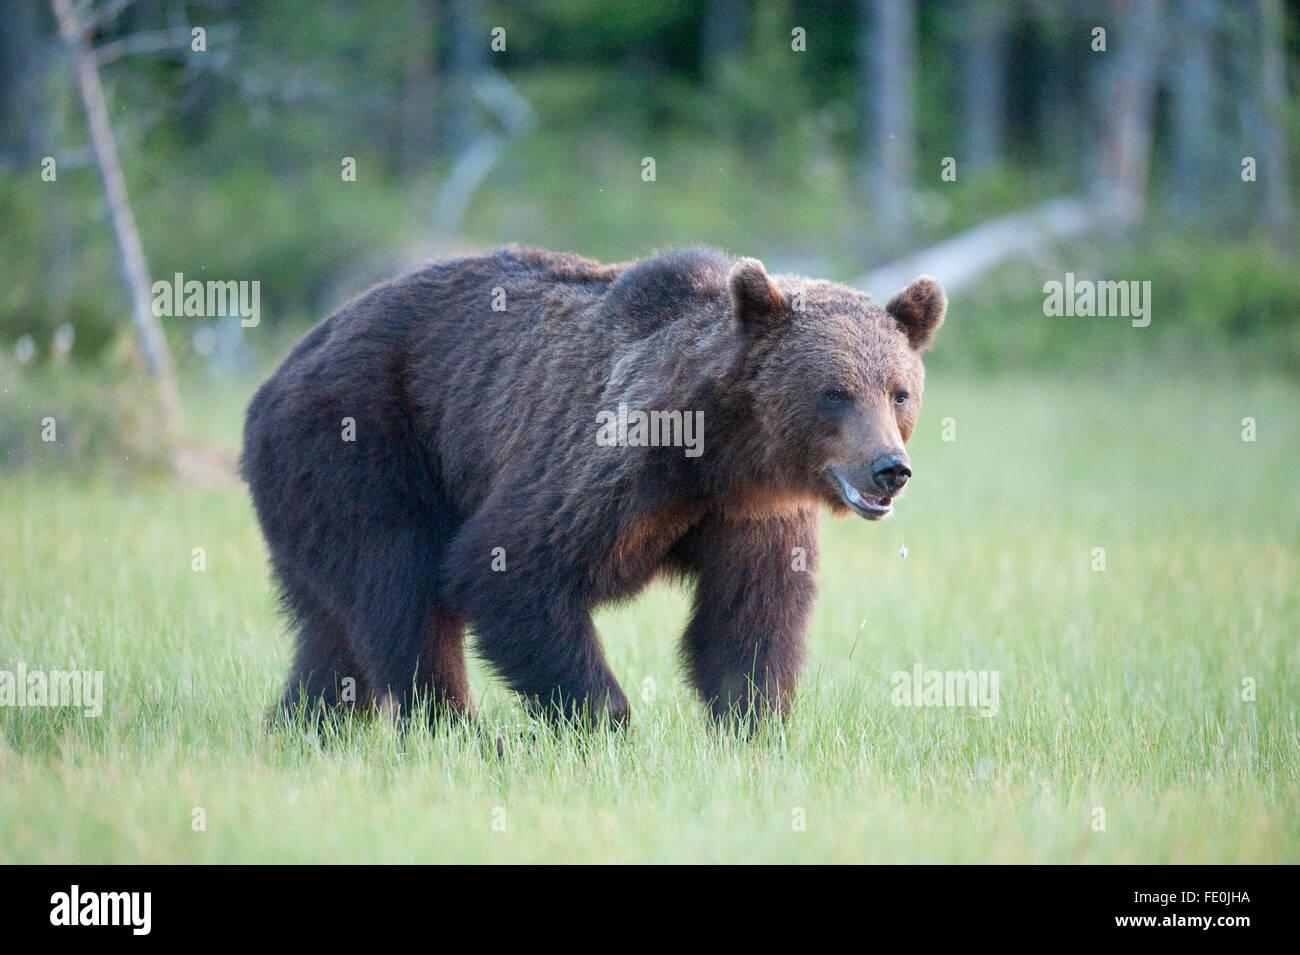 European Brown Bear, Ursus arctos arctos, Finland - Stock Image